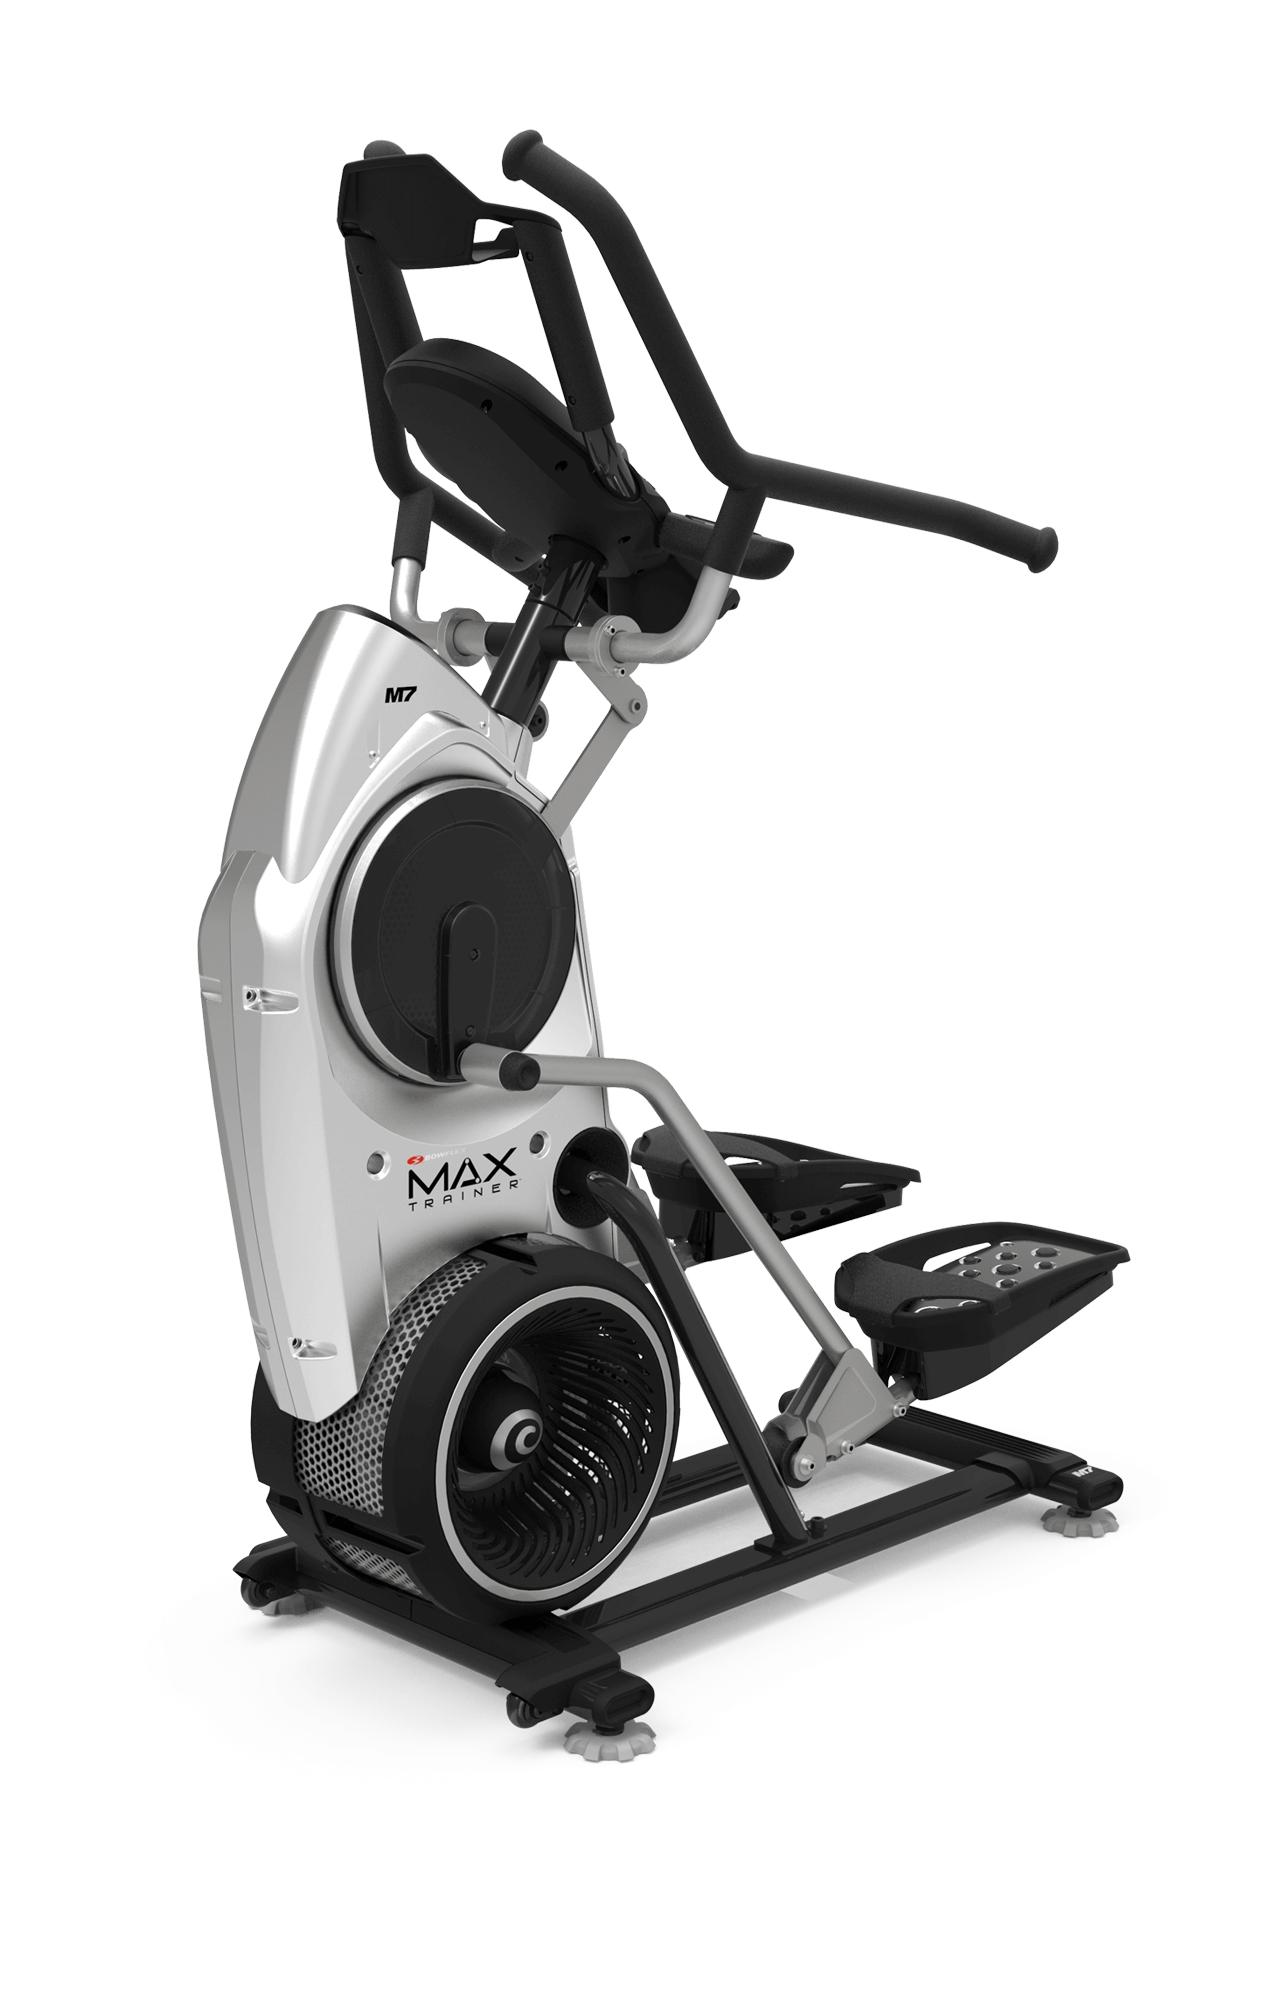 bowflex max trainer m7 nautilus international. Black Bedroom Furniture Sets. Home Design Ideas